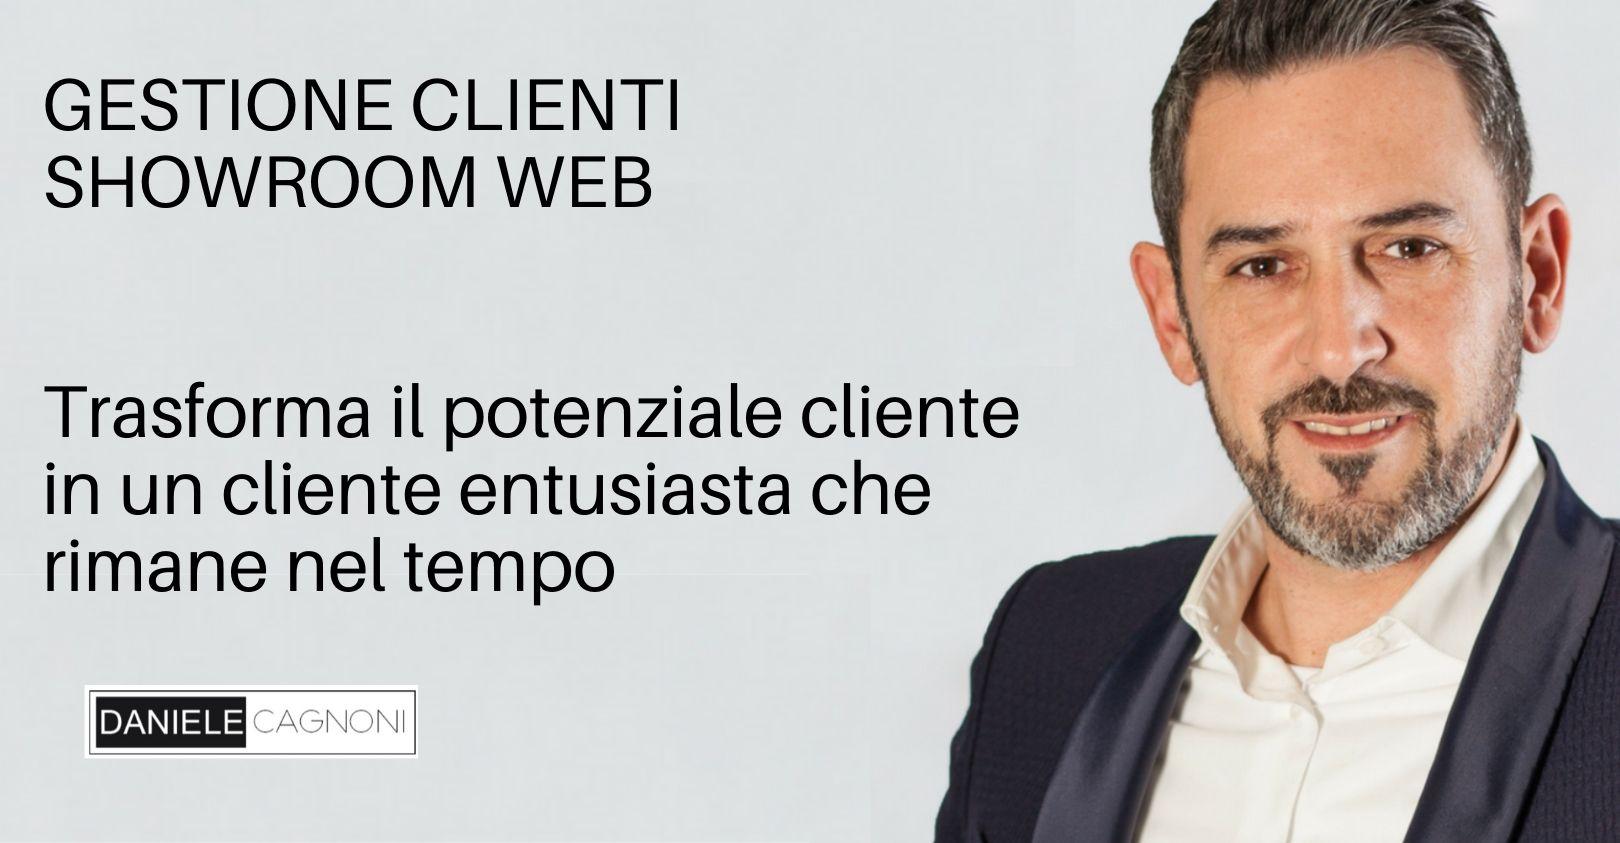 Shworoom web come gestire clienti online